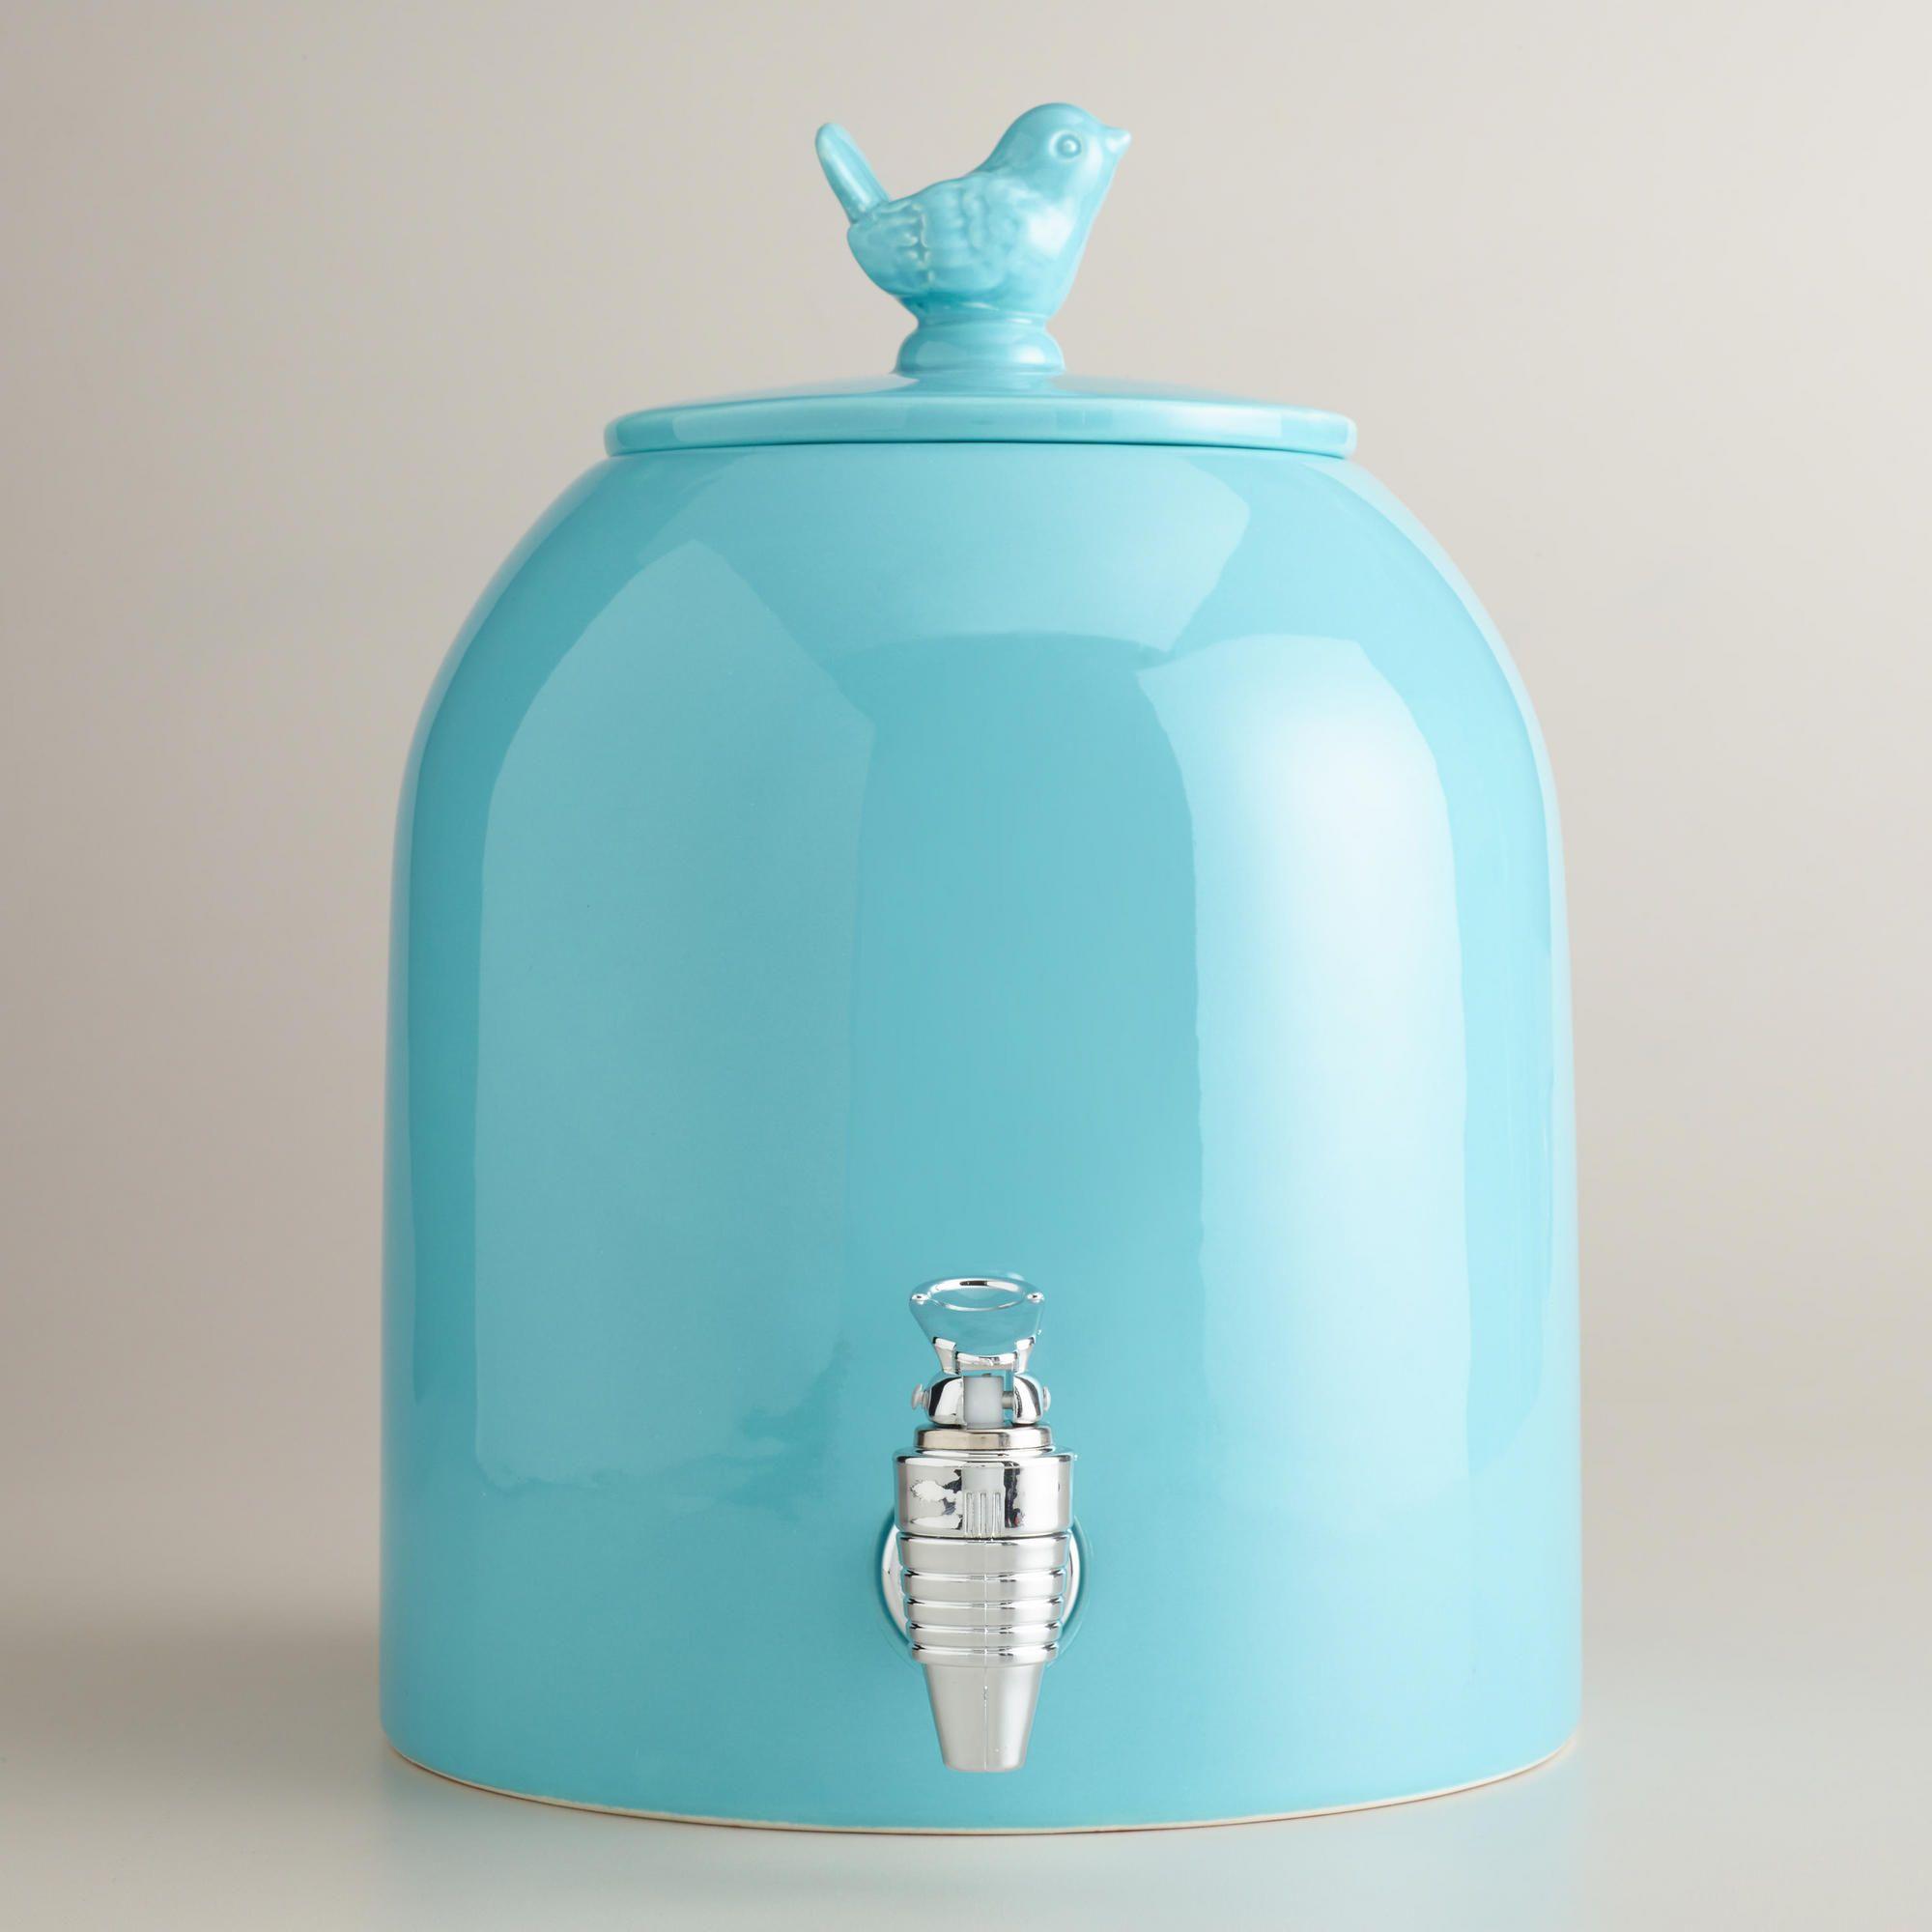 Aqua Bird Ceramic Drink Dispenser   Home Love   Pinterest   Pastell